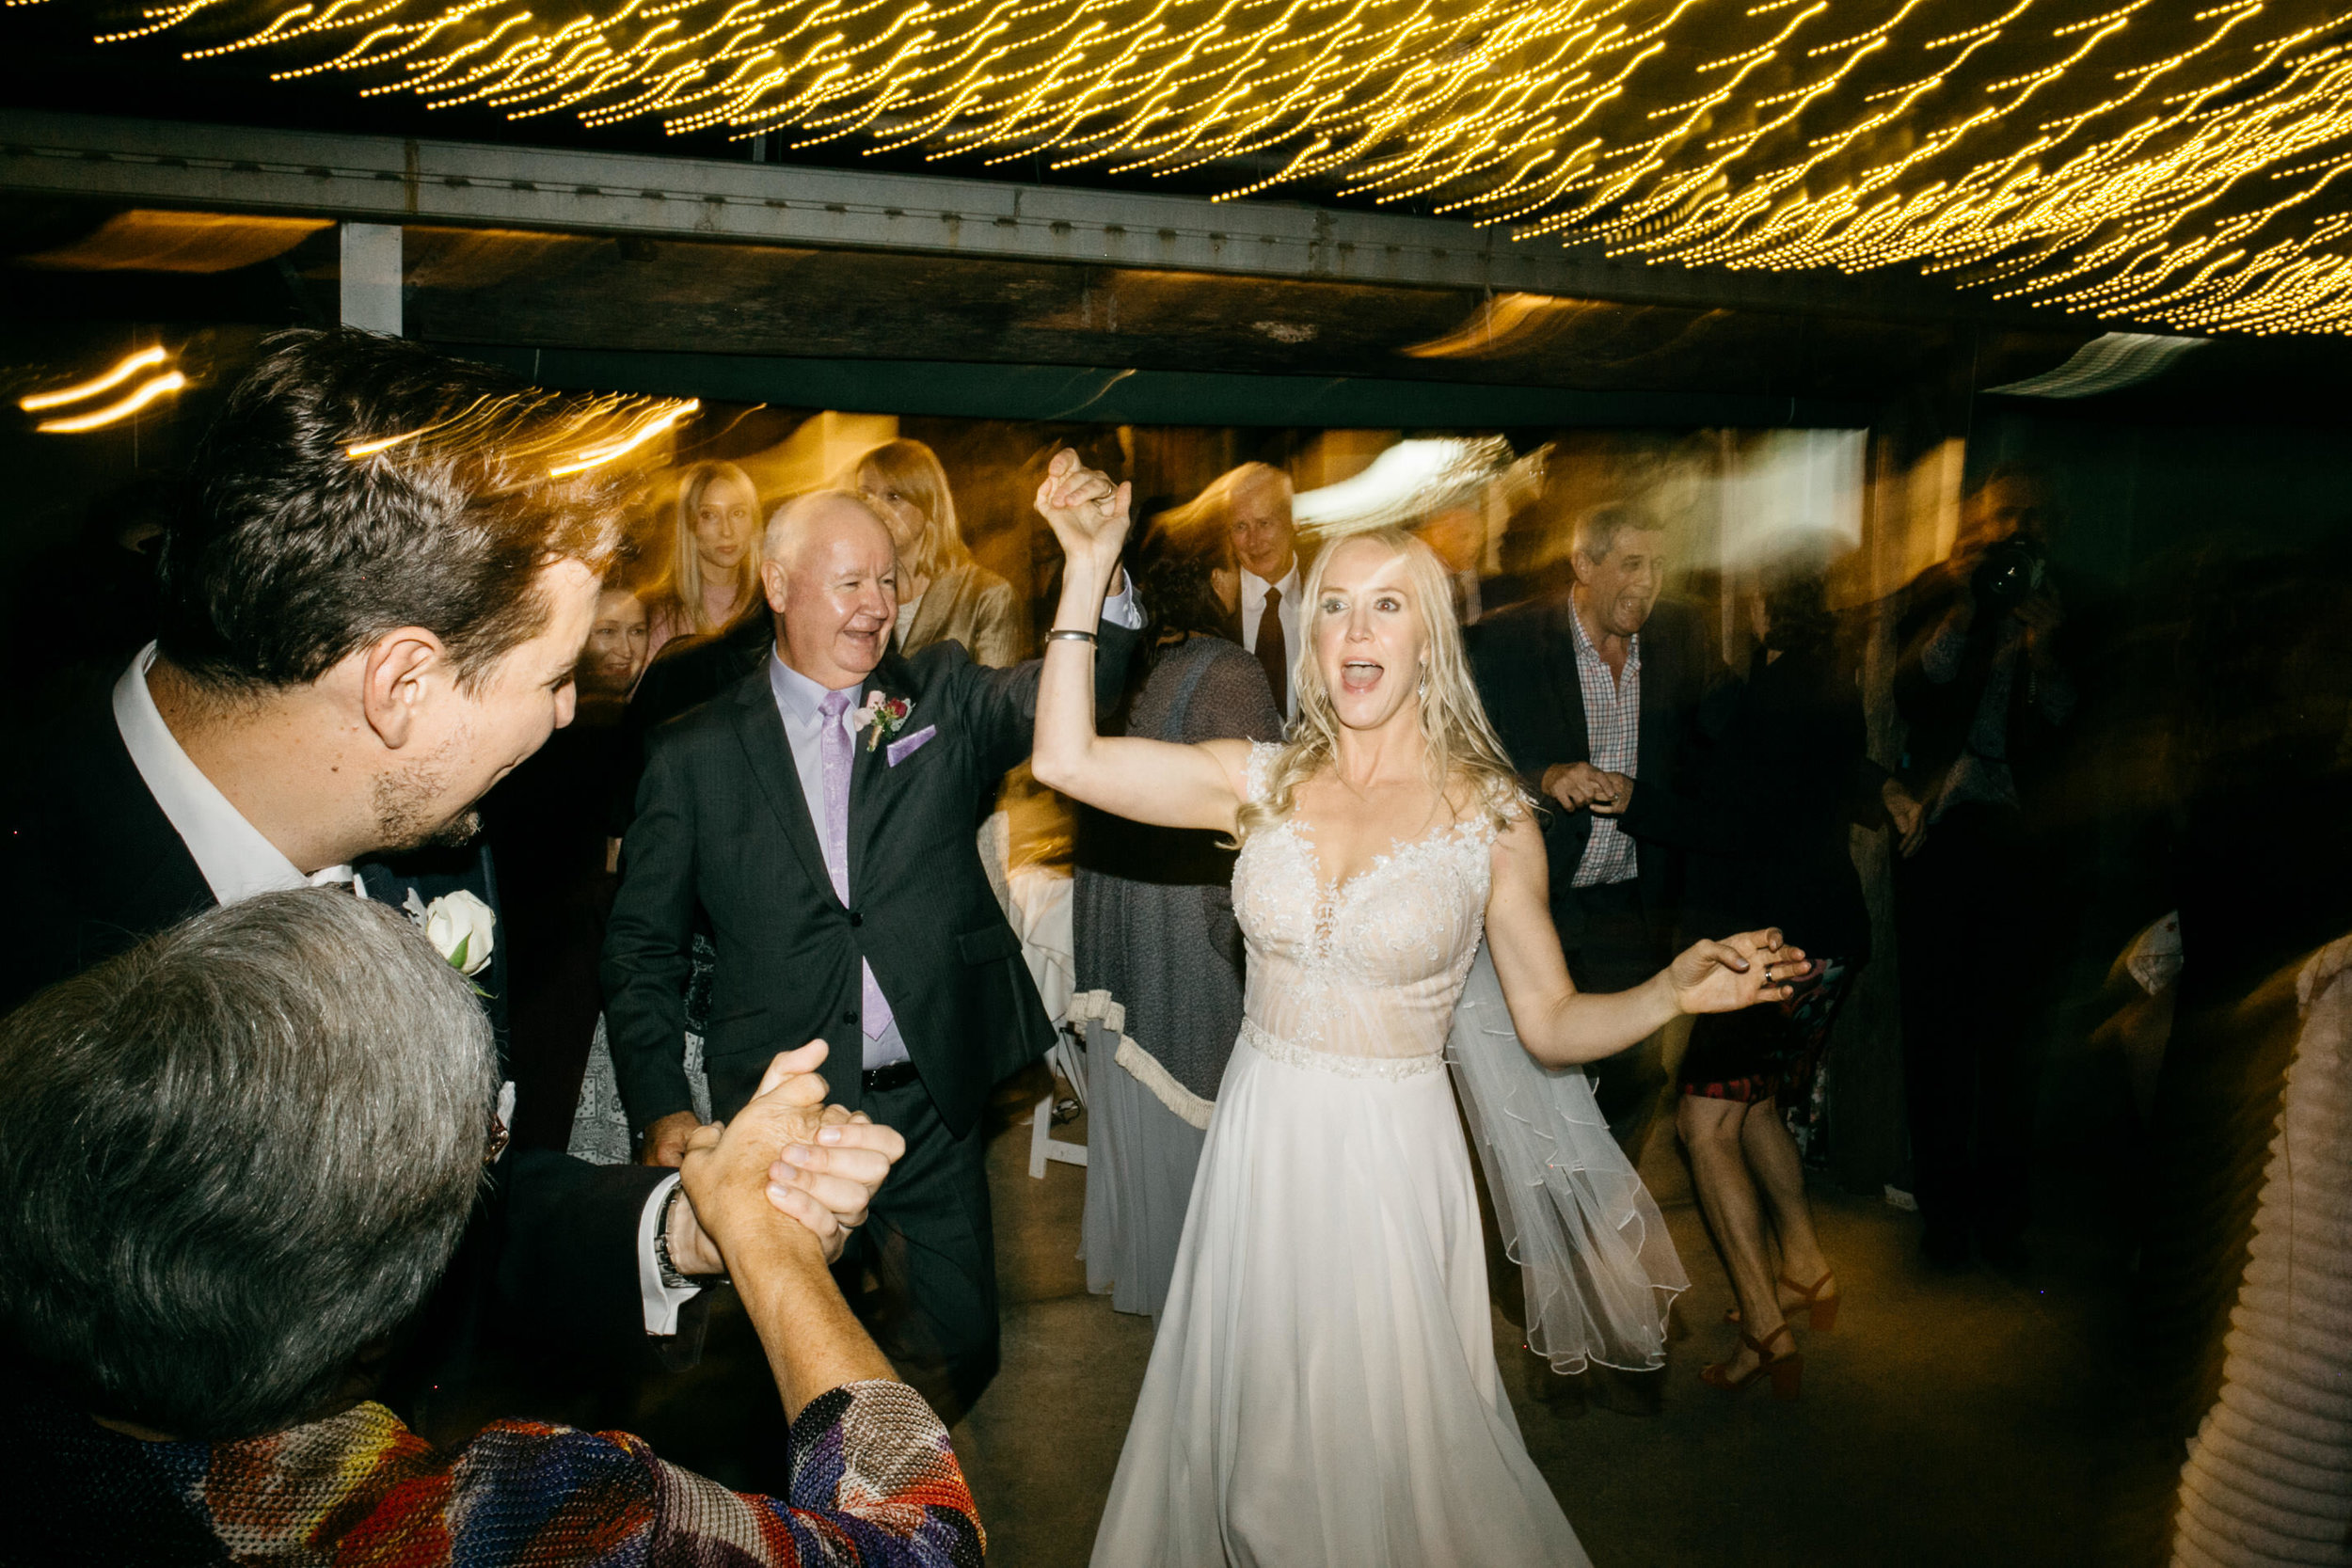 True North Photography_Boomerang Farm_Stacey and Isaac_Gold Coast Wedding_Barm Wedding_Hinterland Wedding-216.jpg